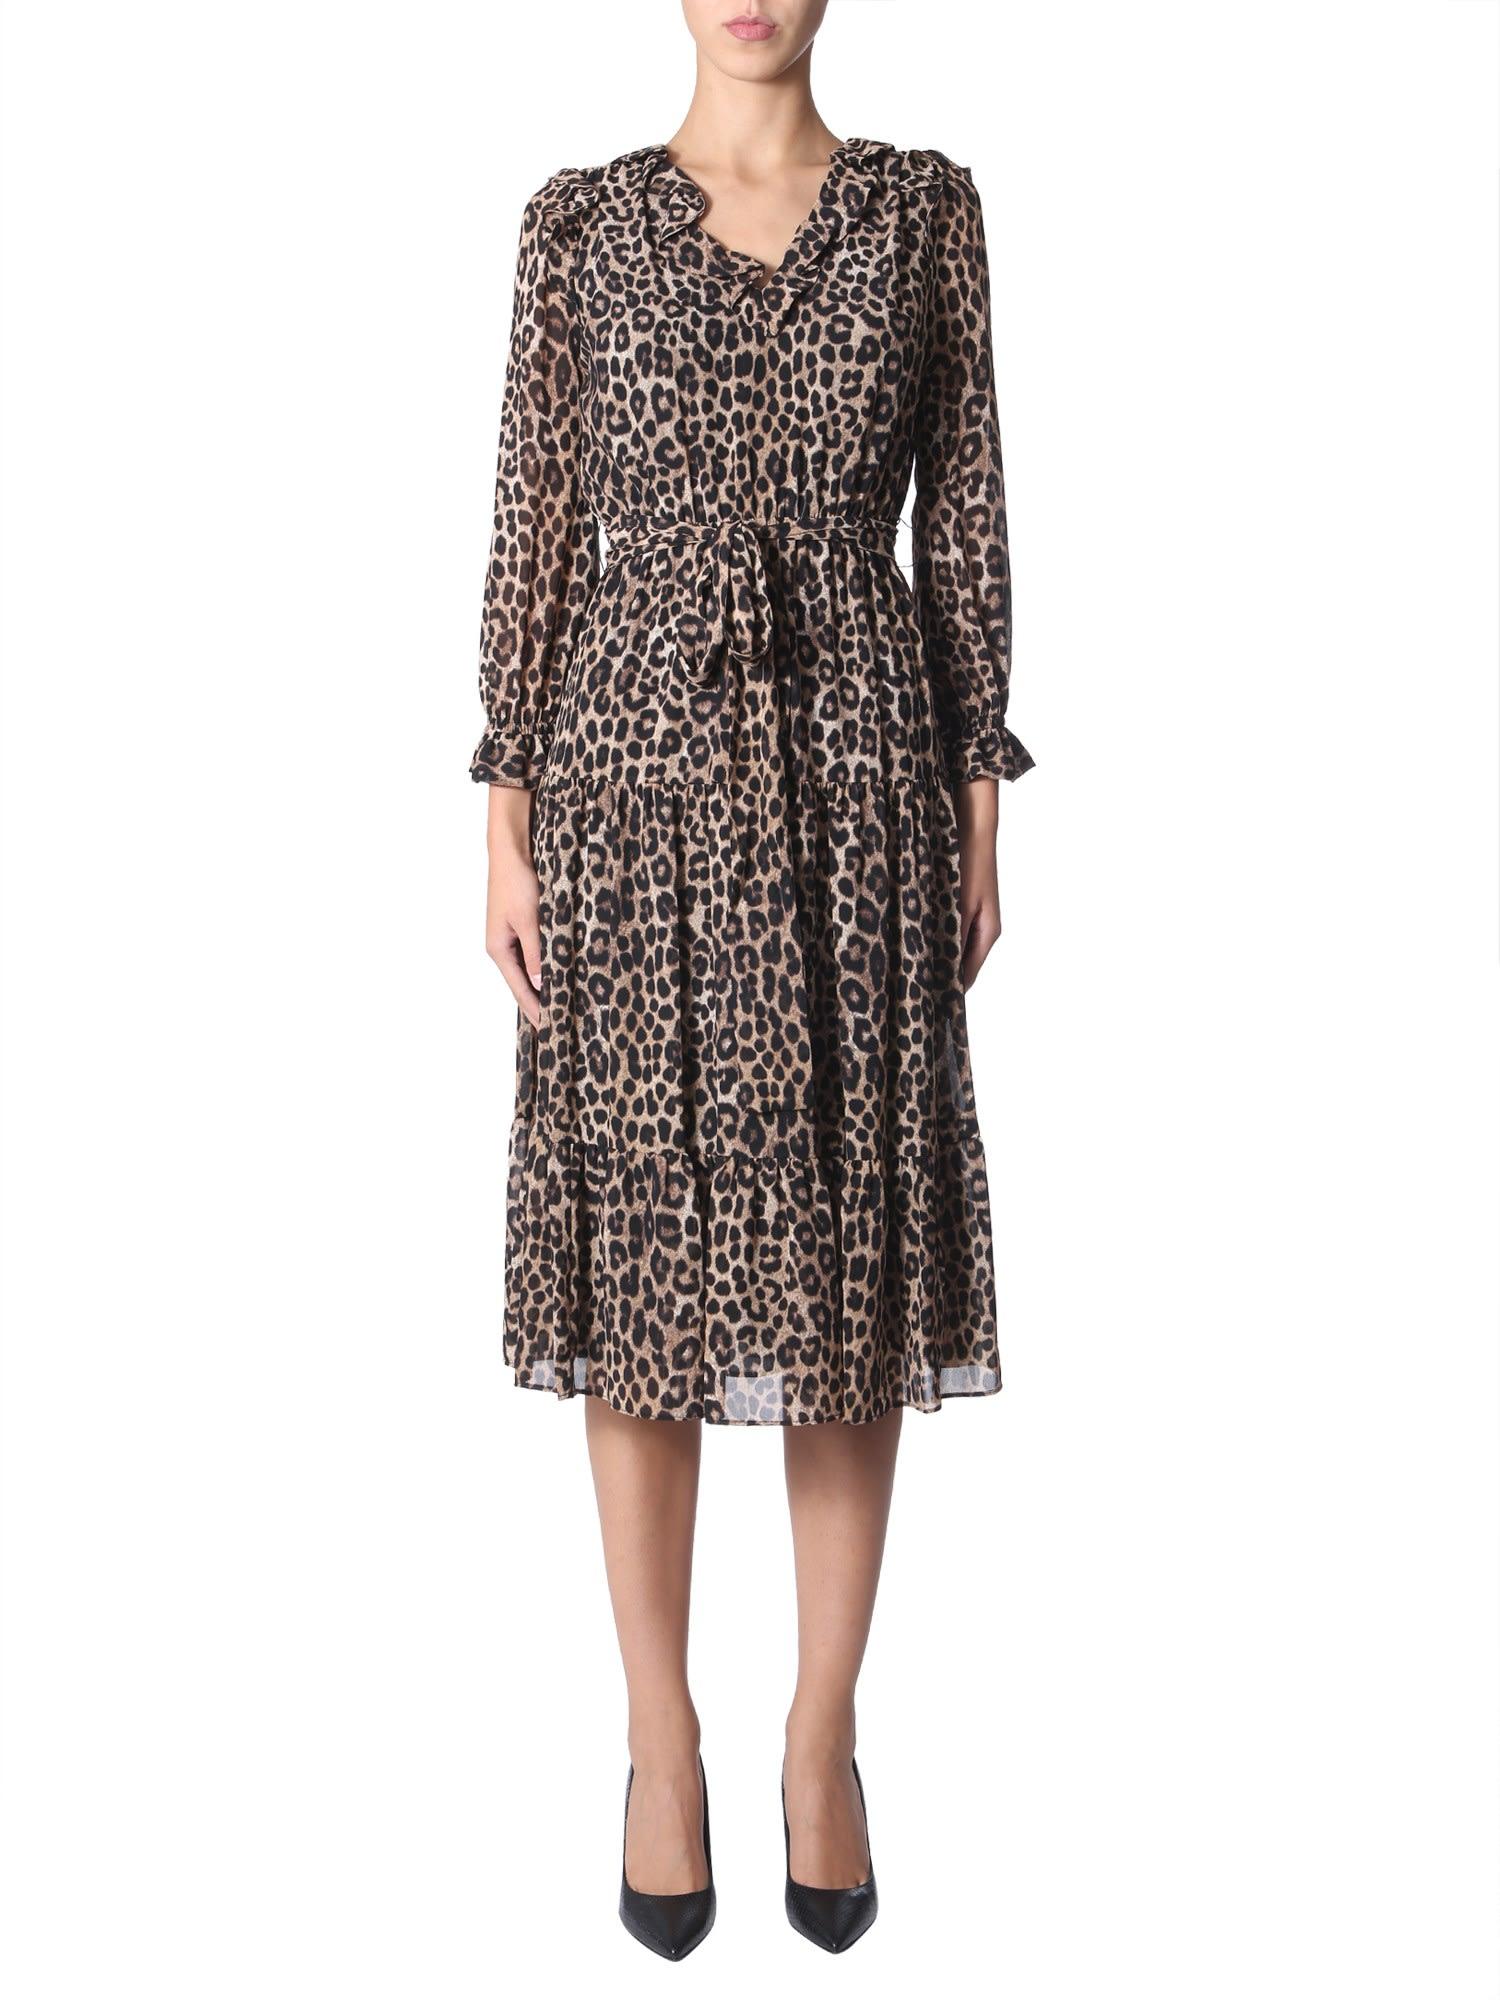 MICHAEL Michael Kors Leopard Print Dress